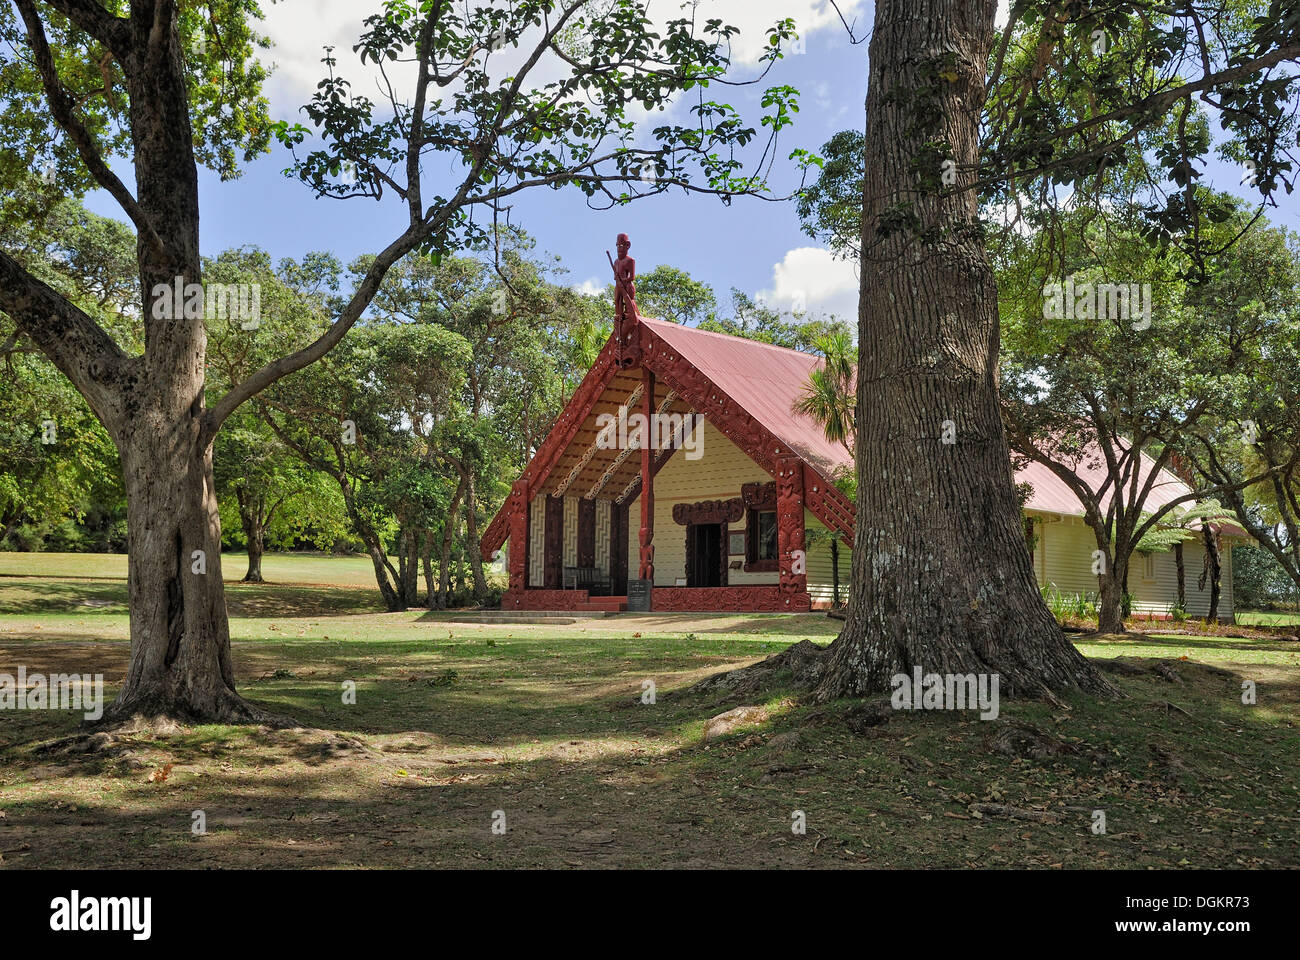 Maori Meeting House, Waitangi Treaty Grounds, Waitangi, North Island, New Zealand Stock Photo